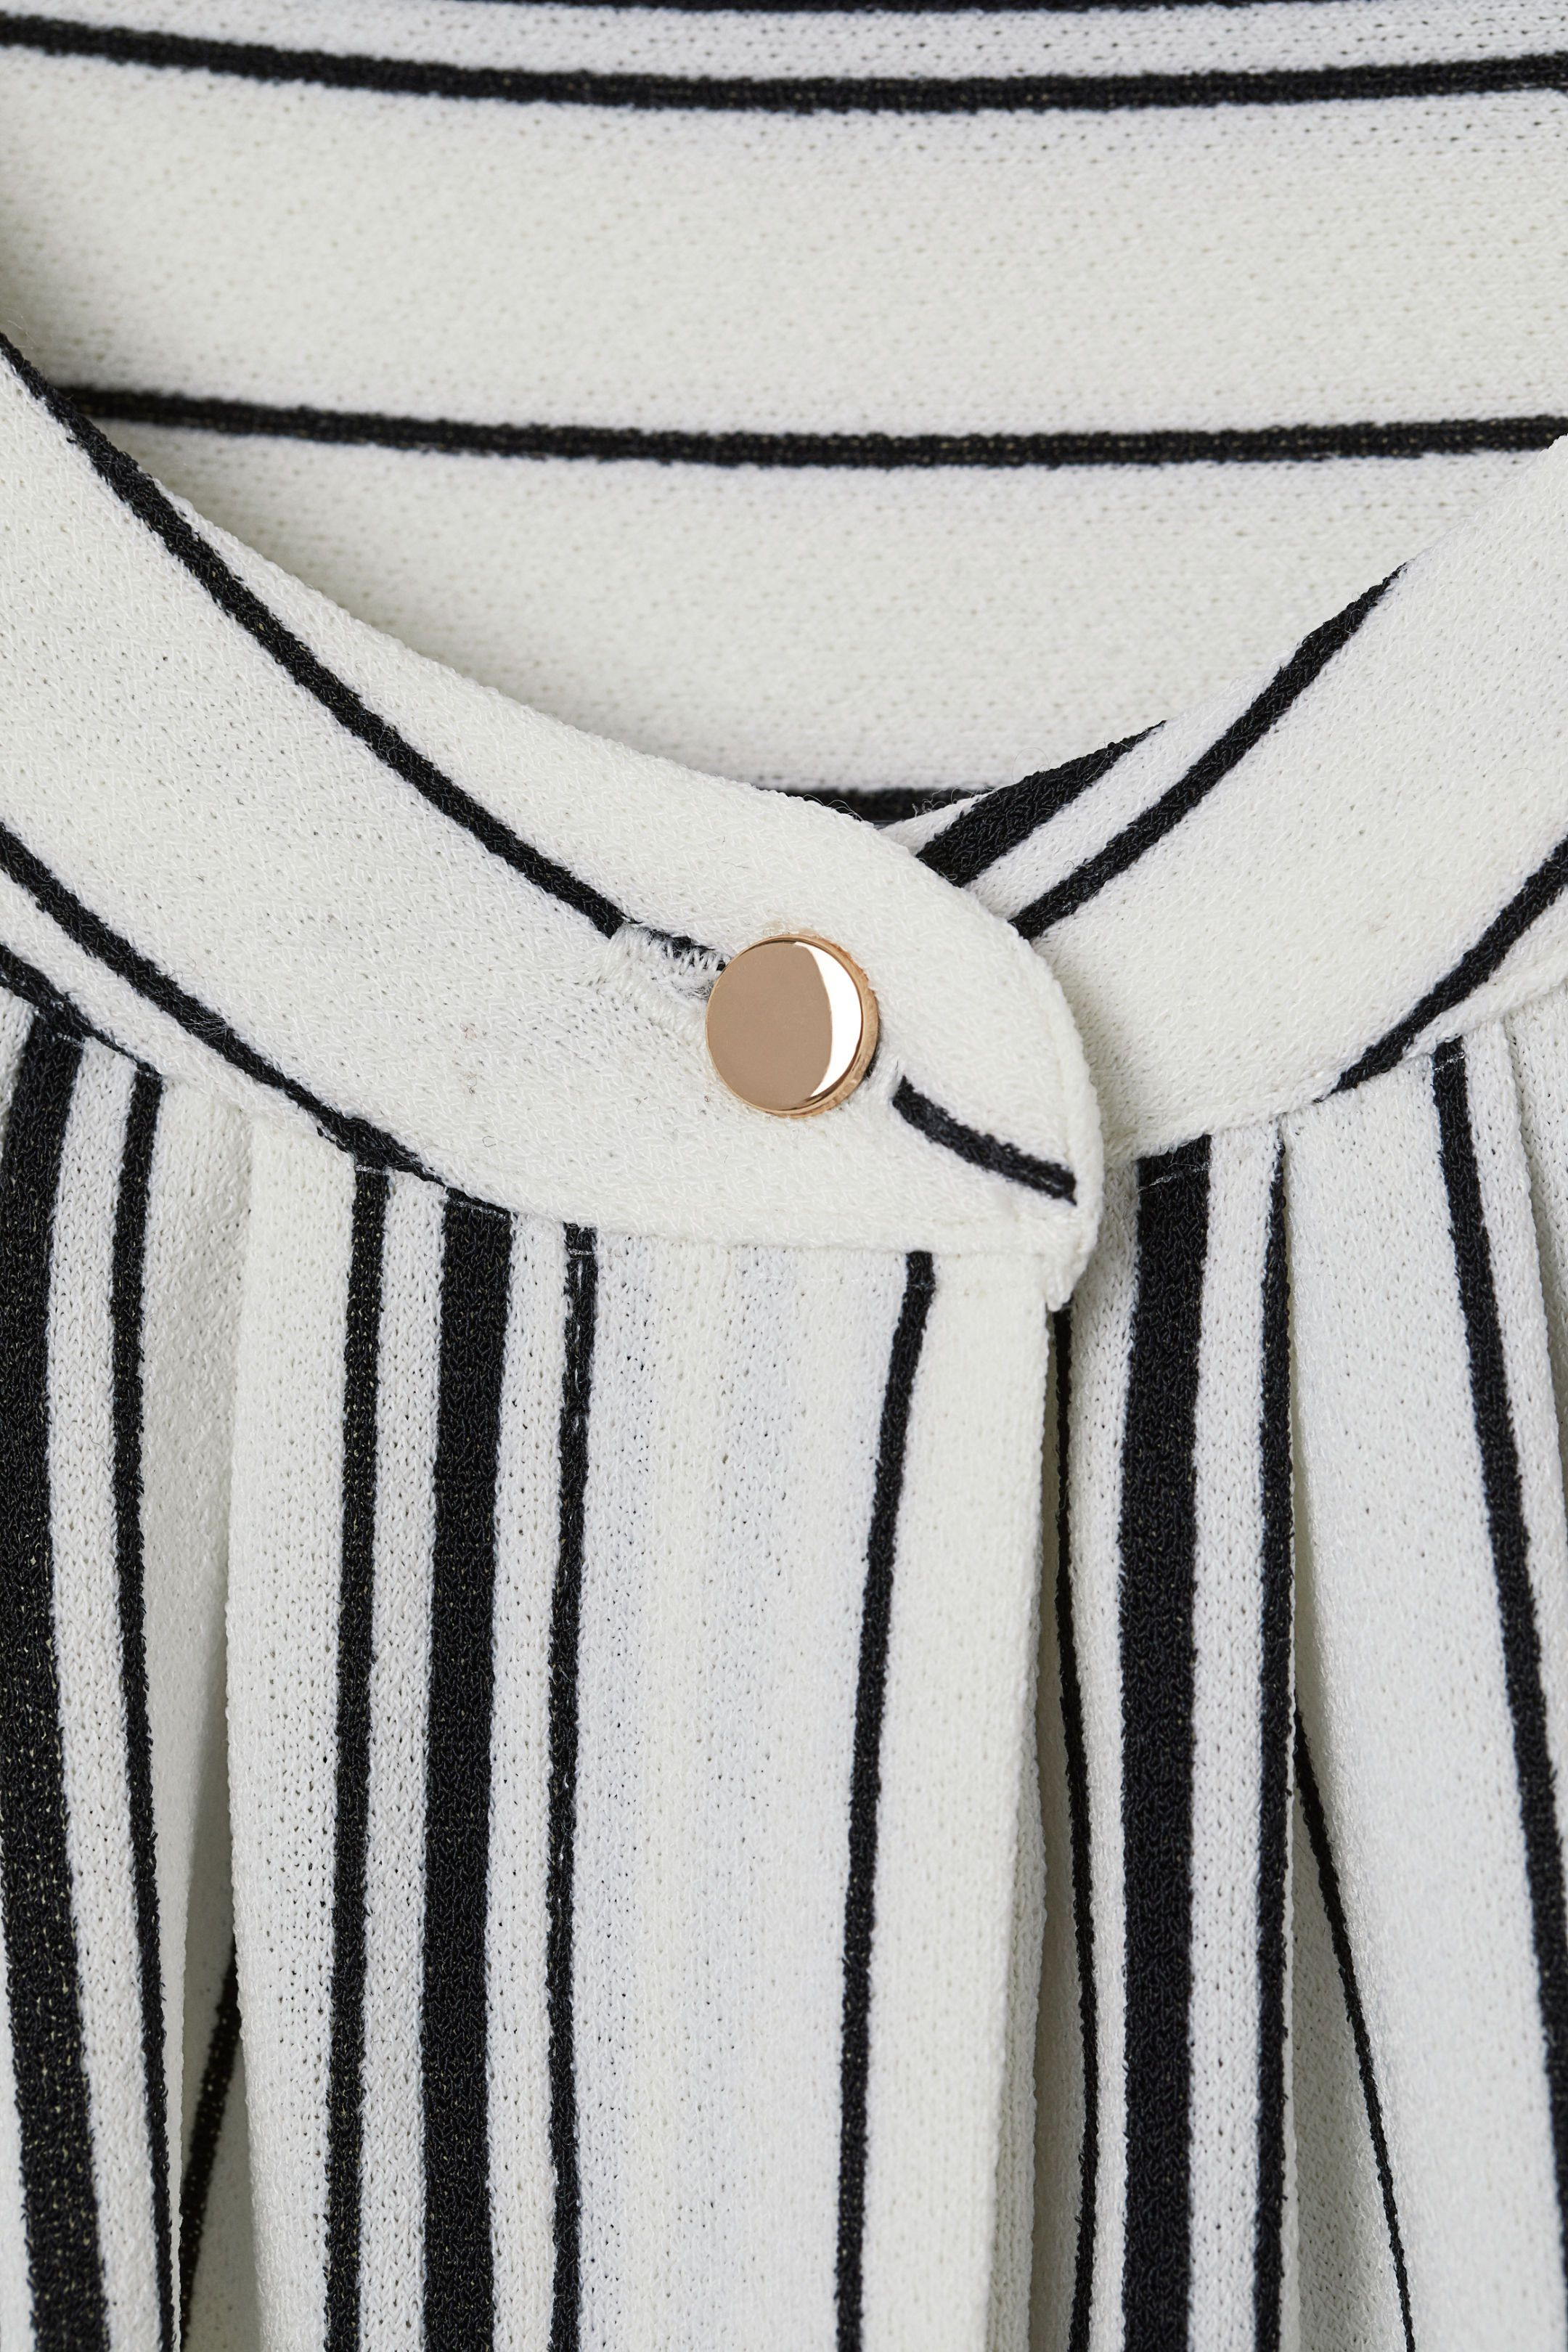 0975d586e61 Sleeveless jersey top in 2019 | lbc strips | Black stripes, Tops ...